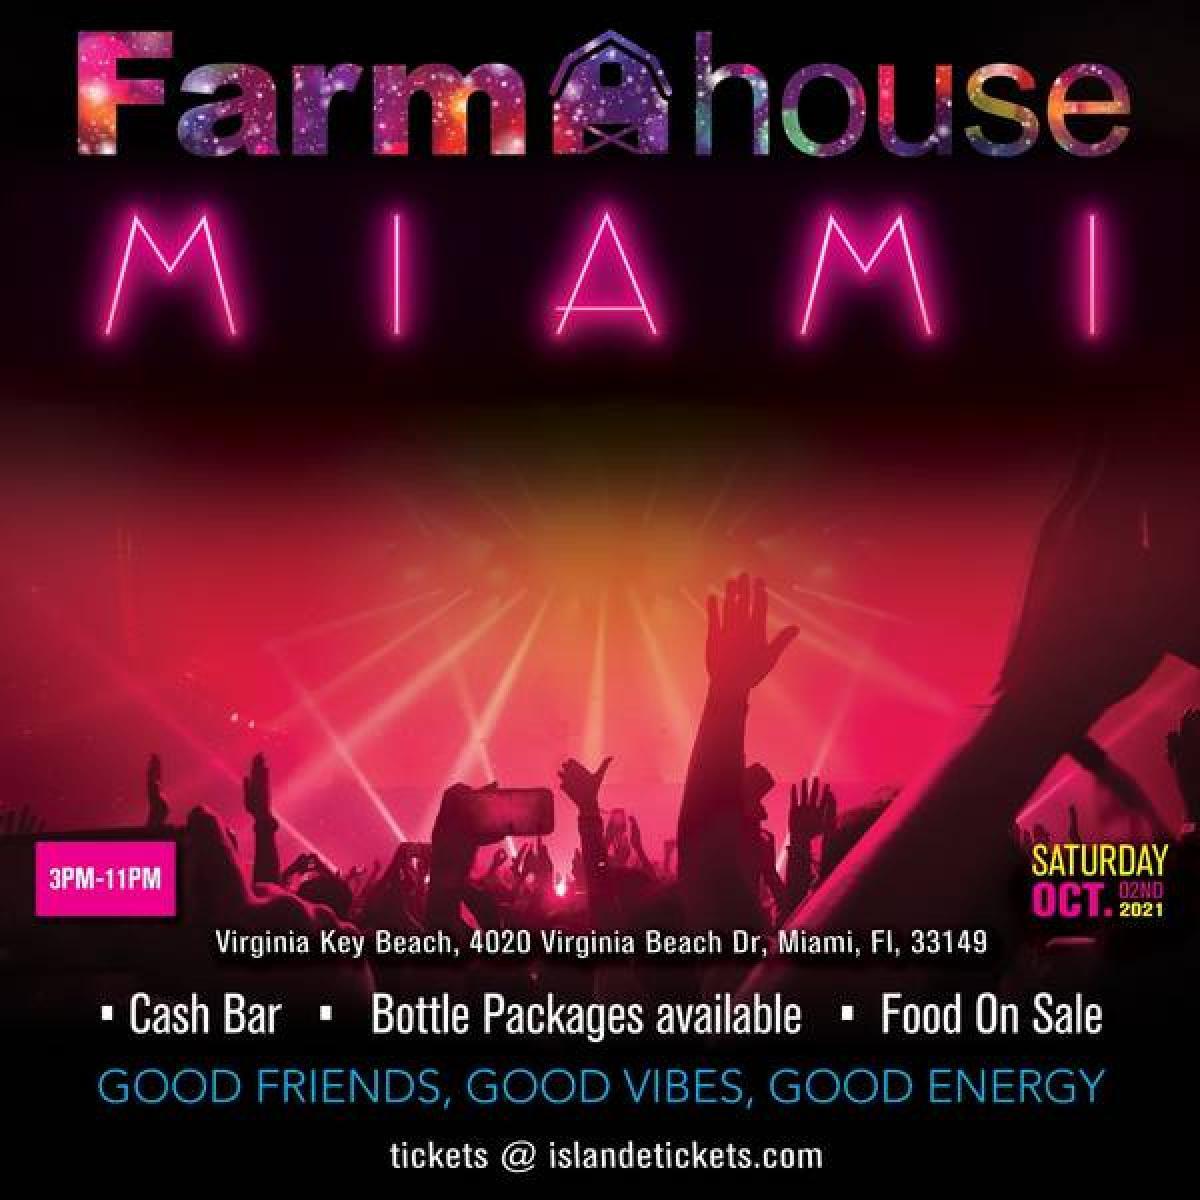 Farmhouse Miami flyer or graphic.